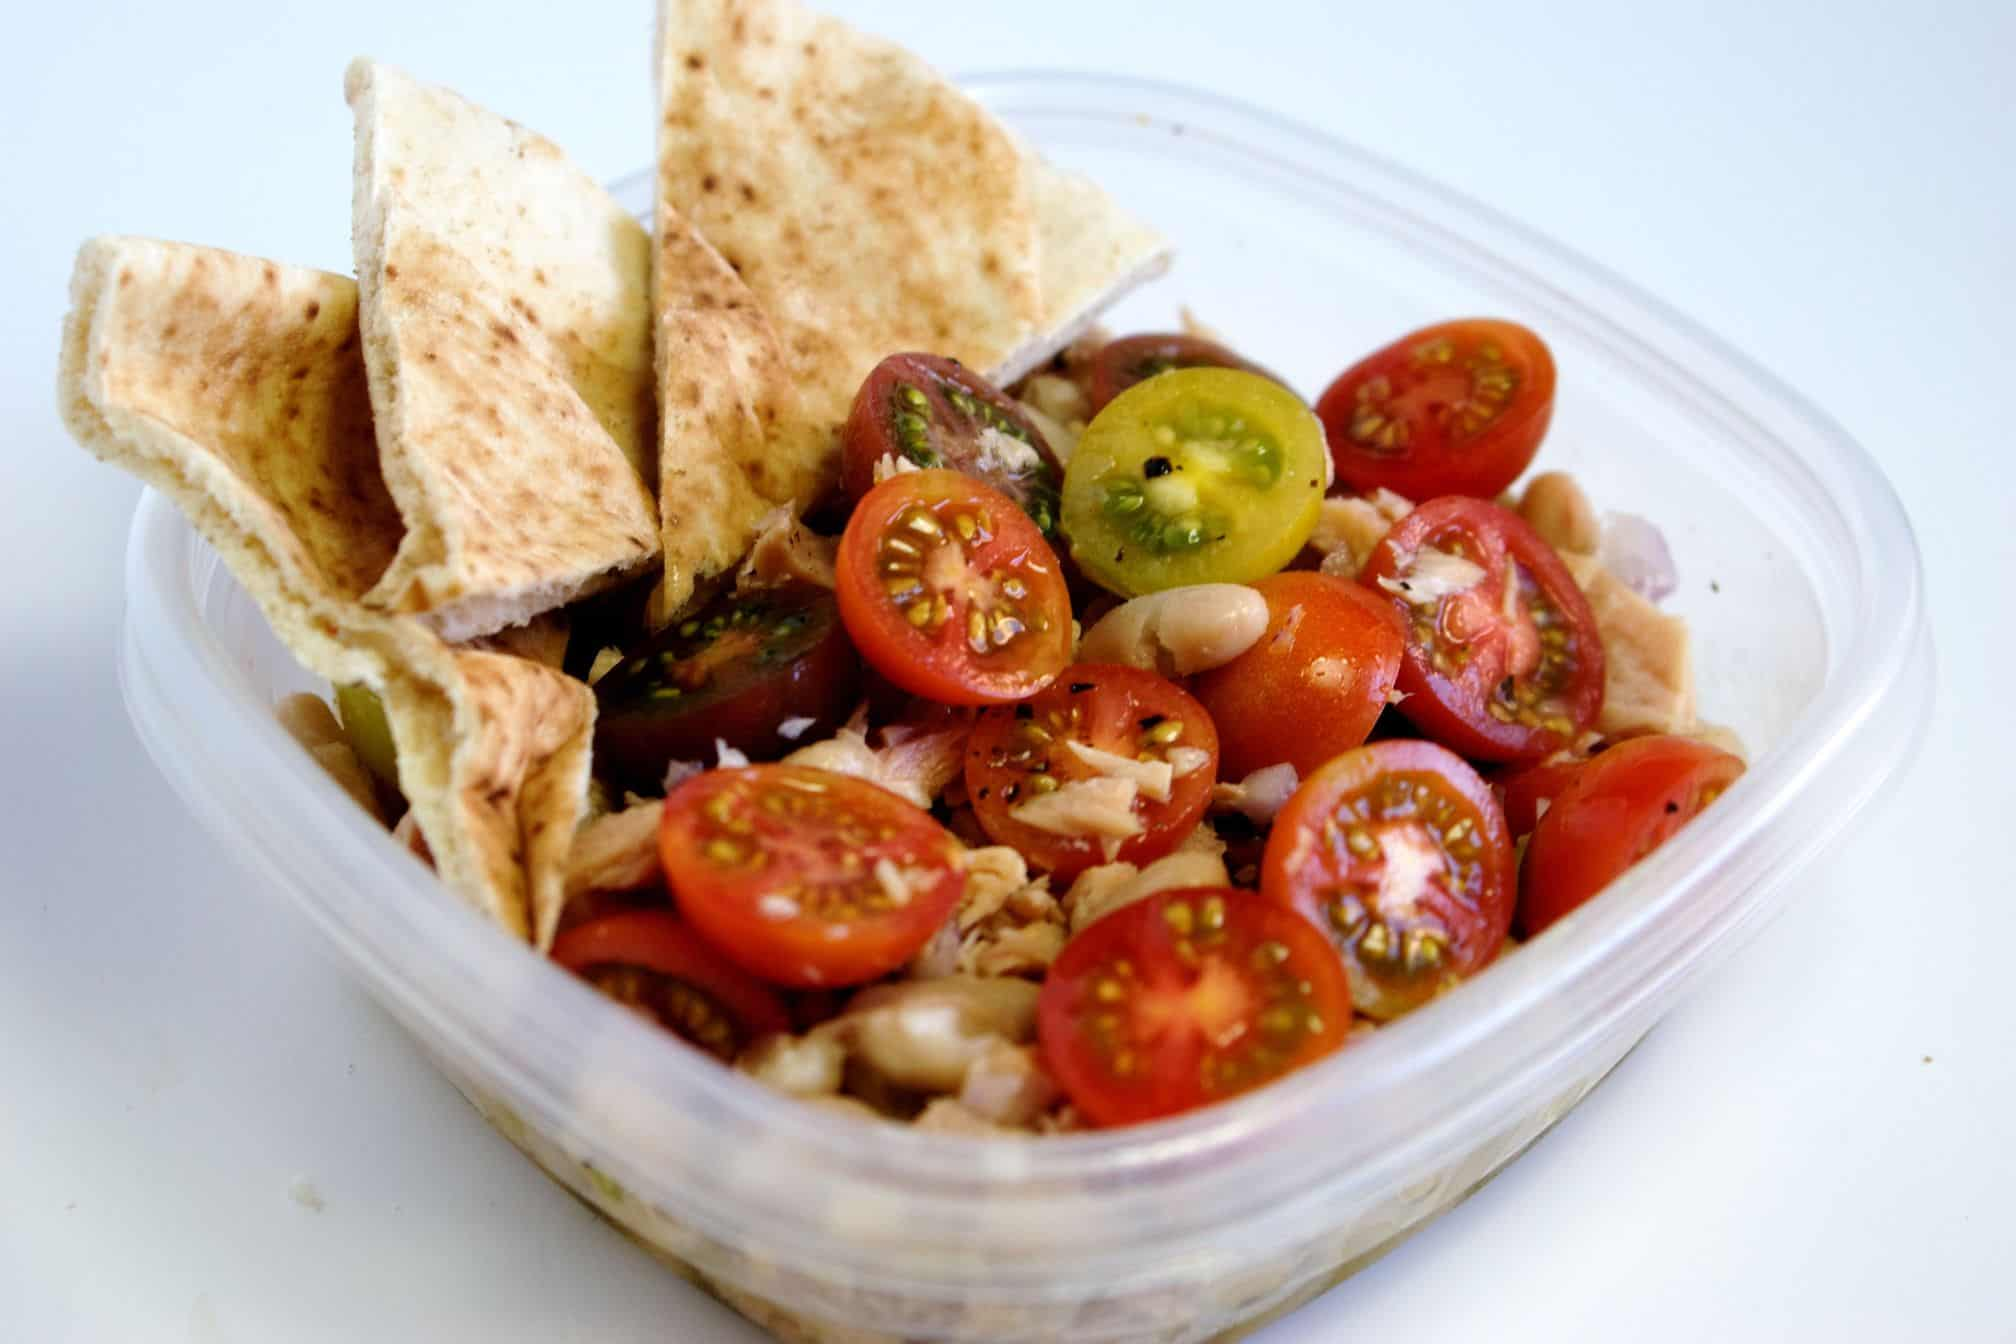 Tuna and white bean salad with tomatoes